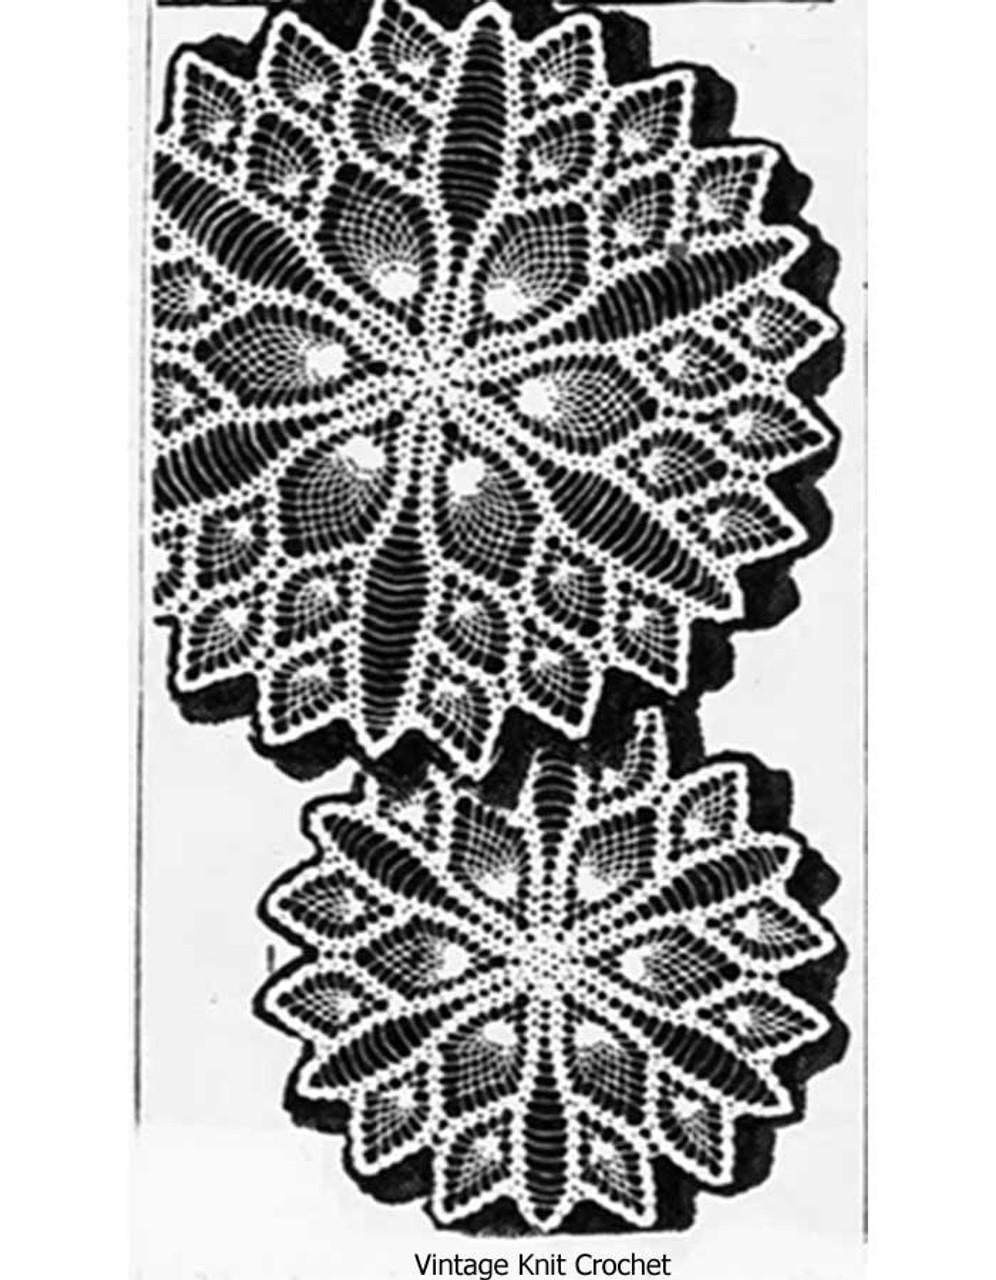 Vintage Large Small Crochet Pineapple Doilies Pattern Design 7530